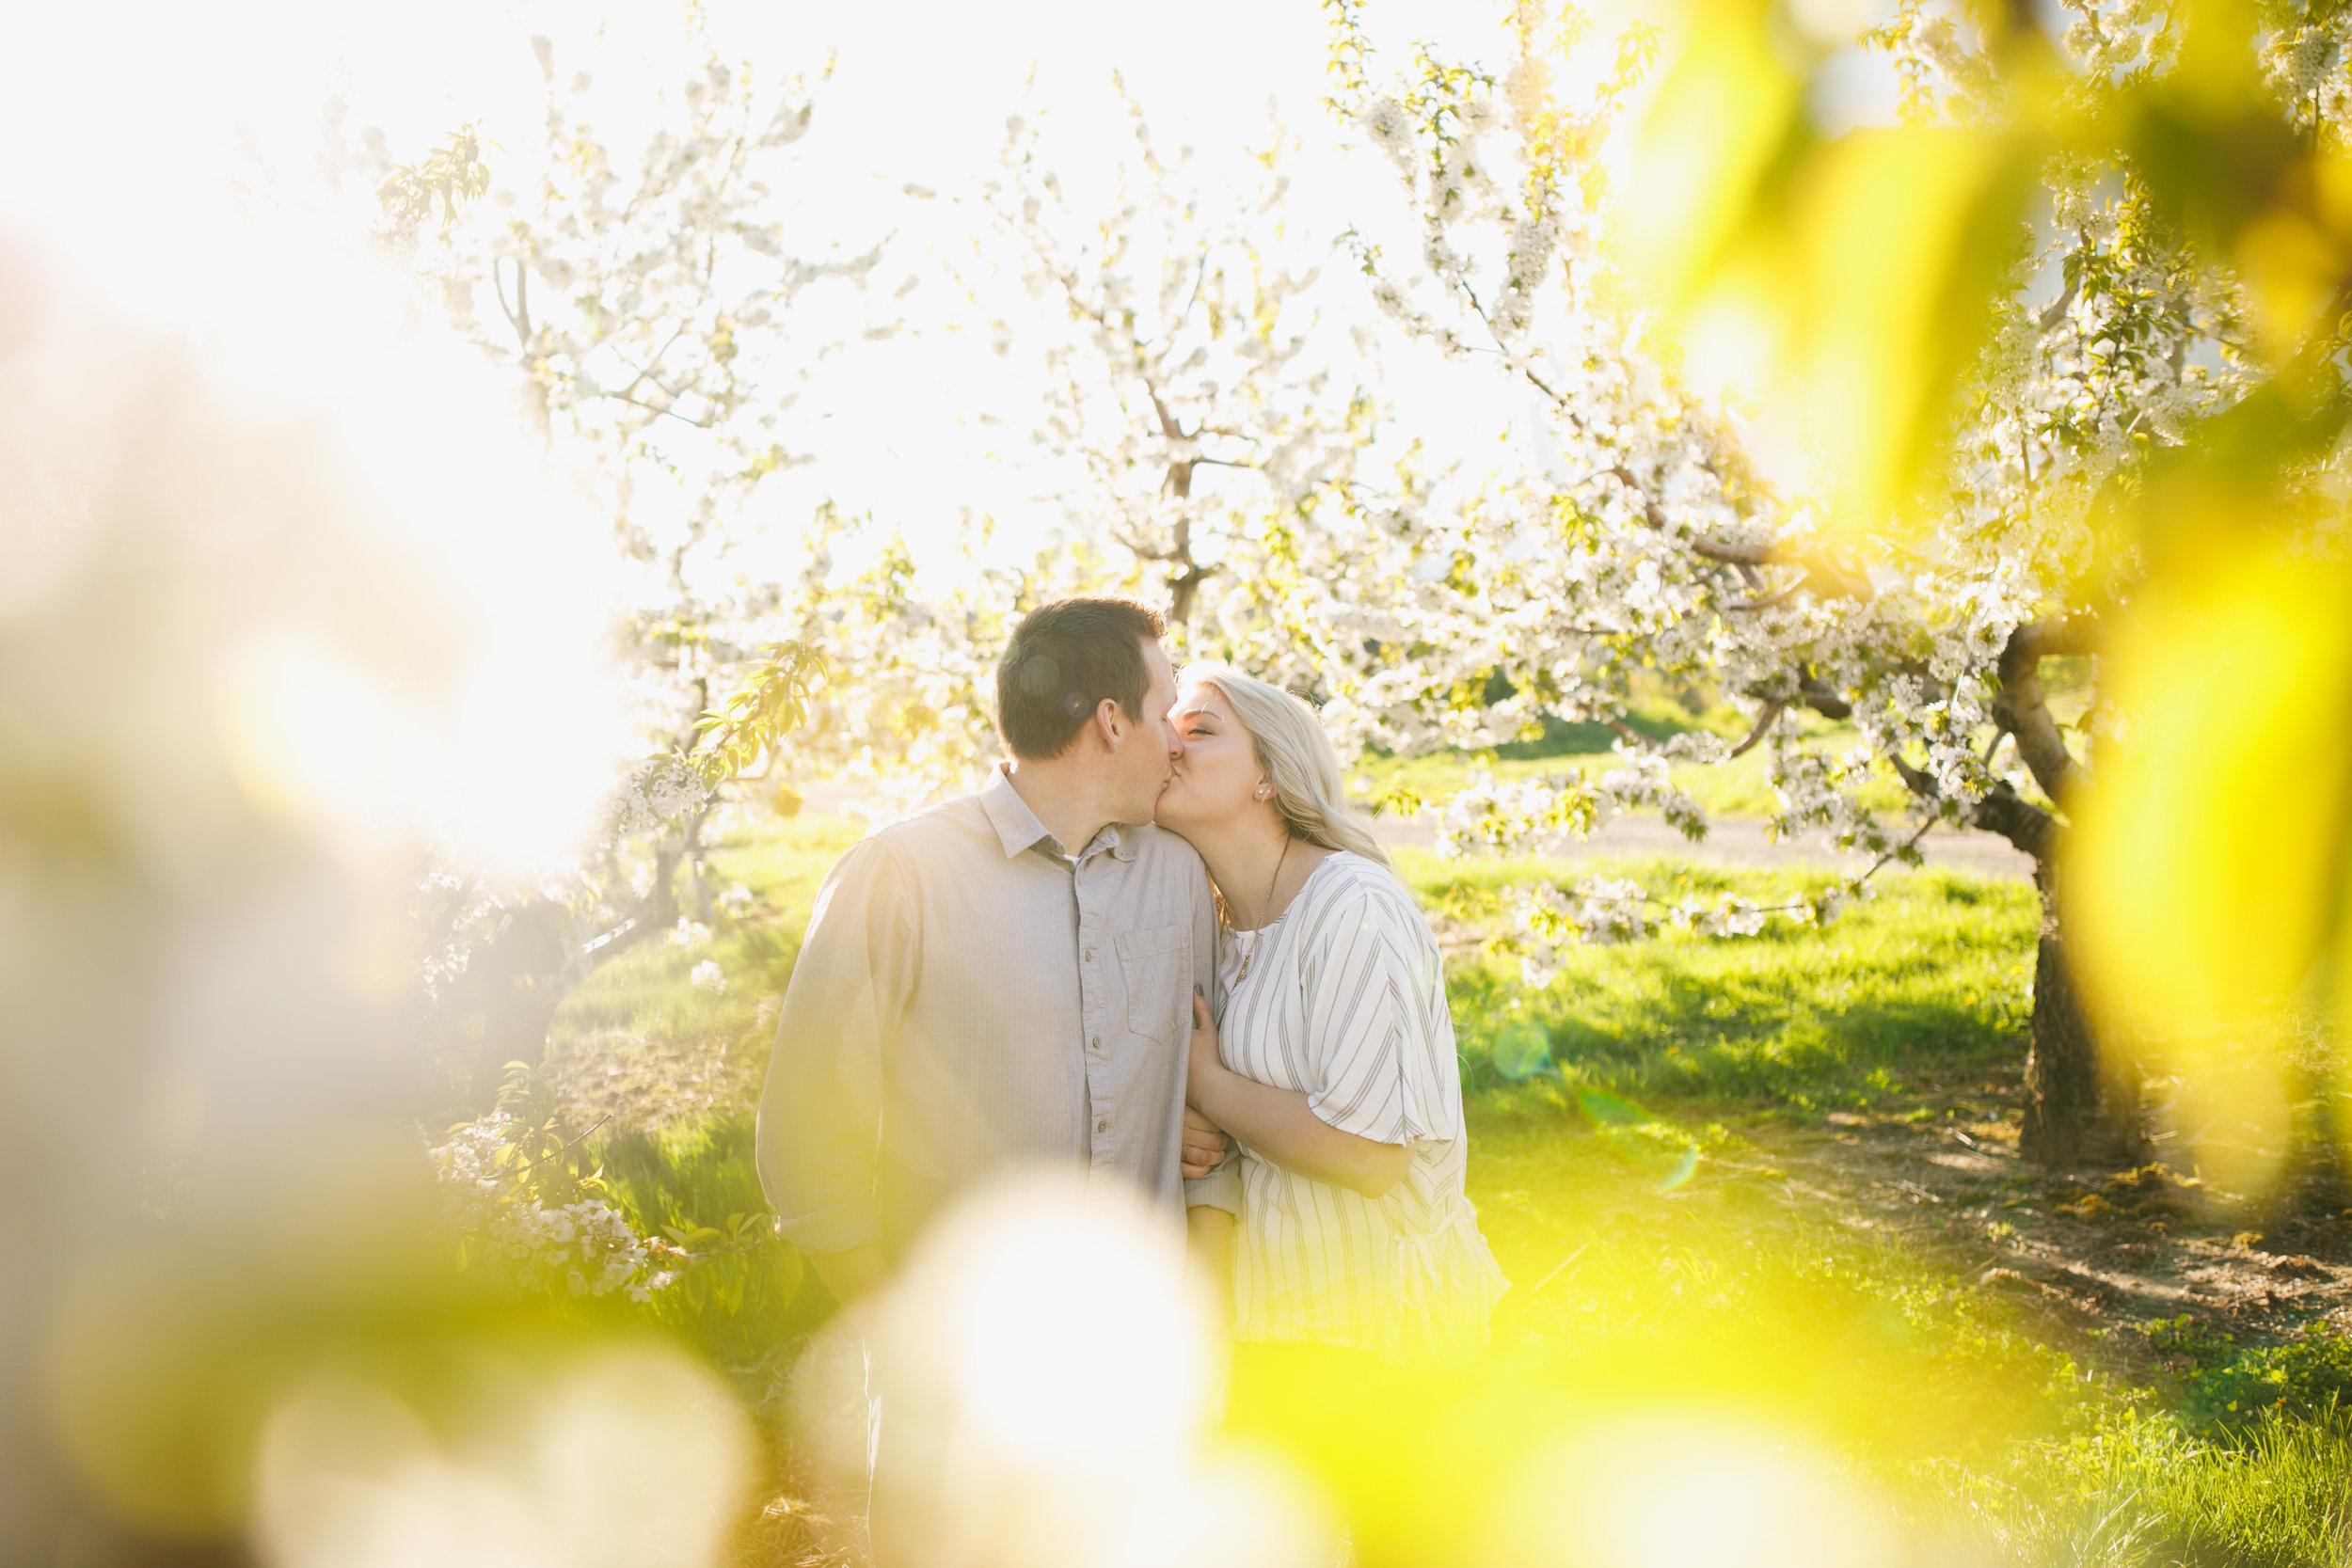 Grand Rapids Photographer - J Darling Photo - jessica darling - grand rapids wedding photographer - sparta airport - sparta michigan - jasmine and jeff engaged 017.jpg